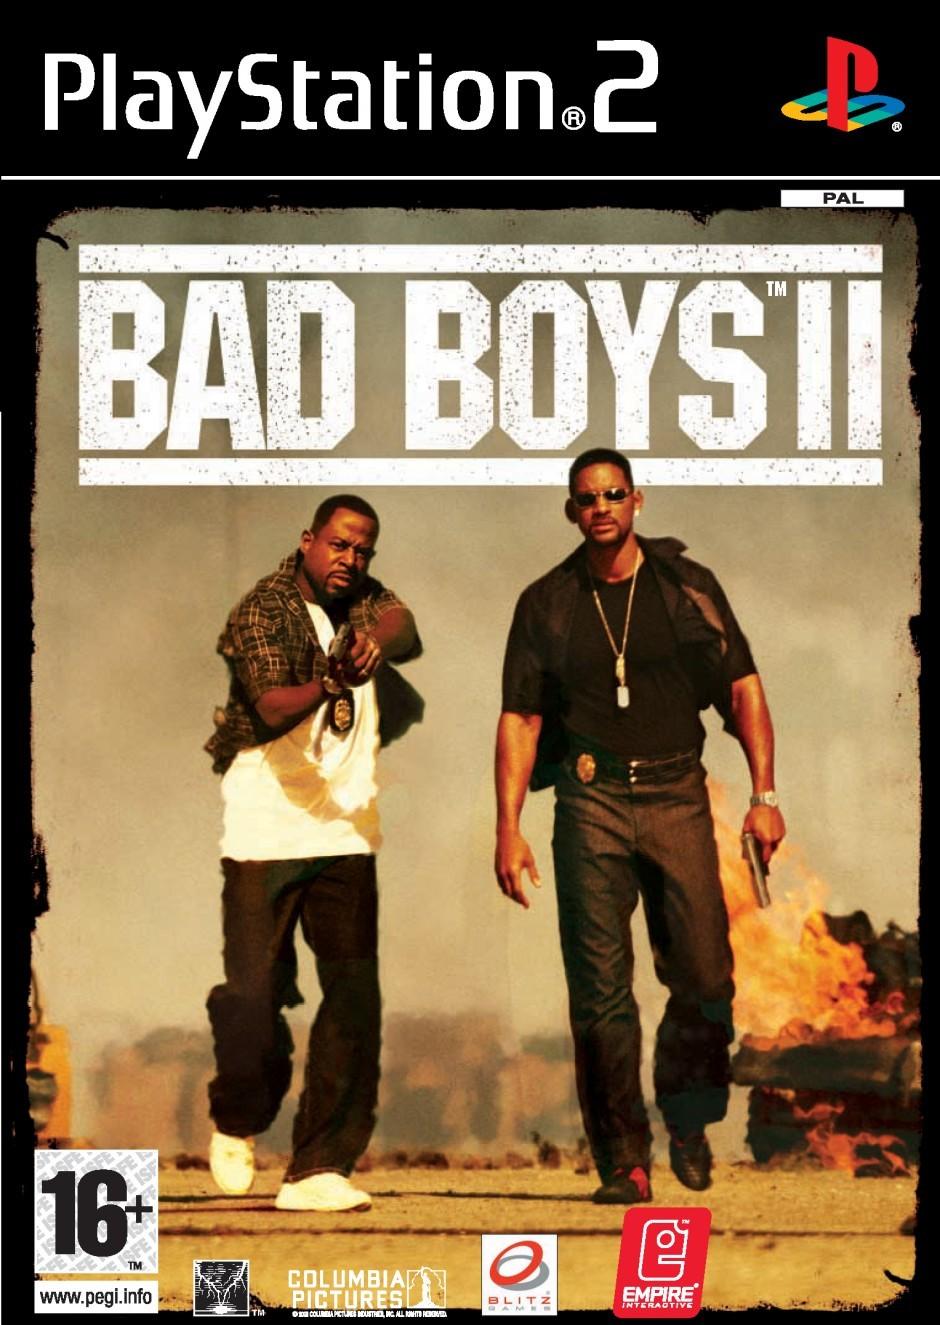 Bad boys 2 free download pc game (full version).